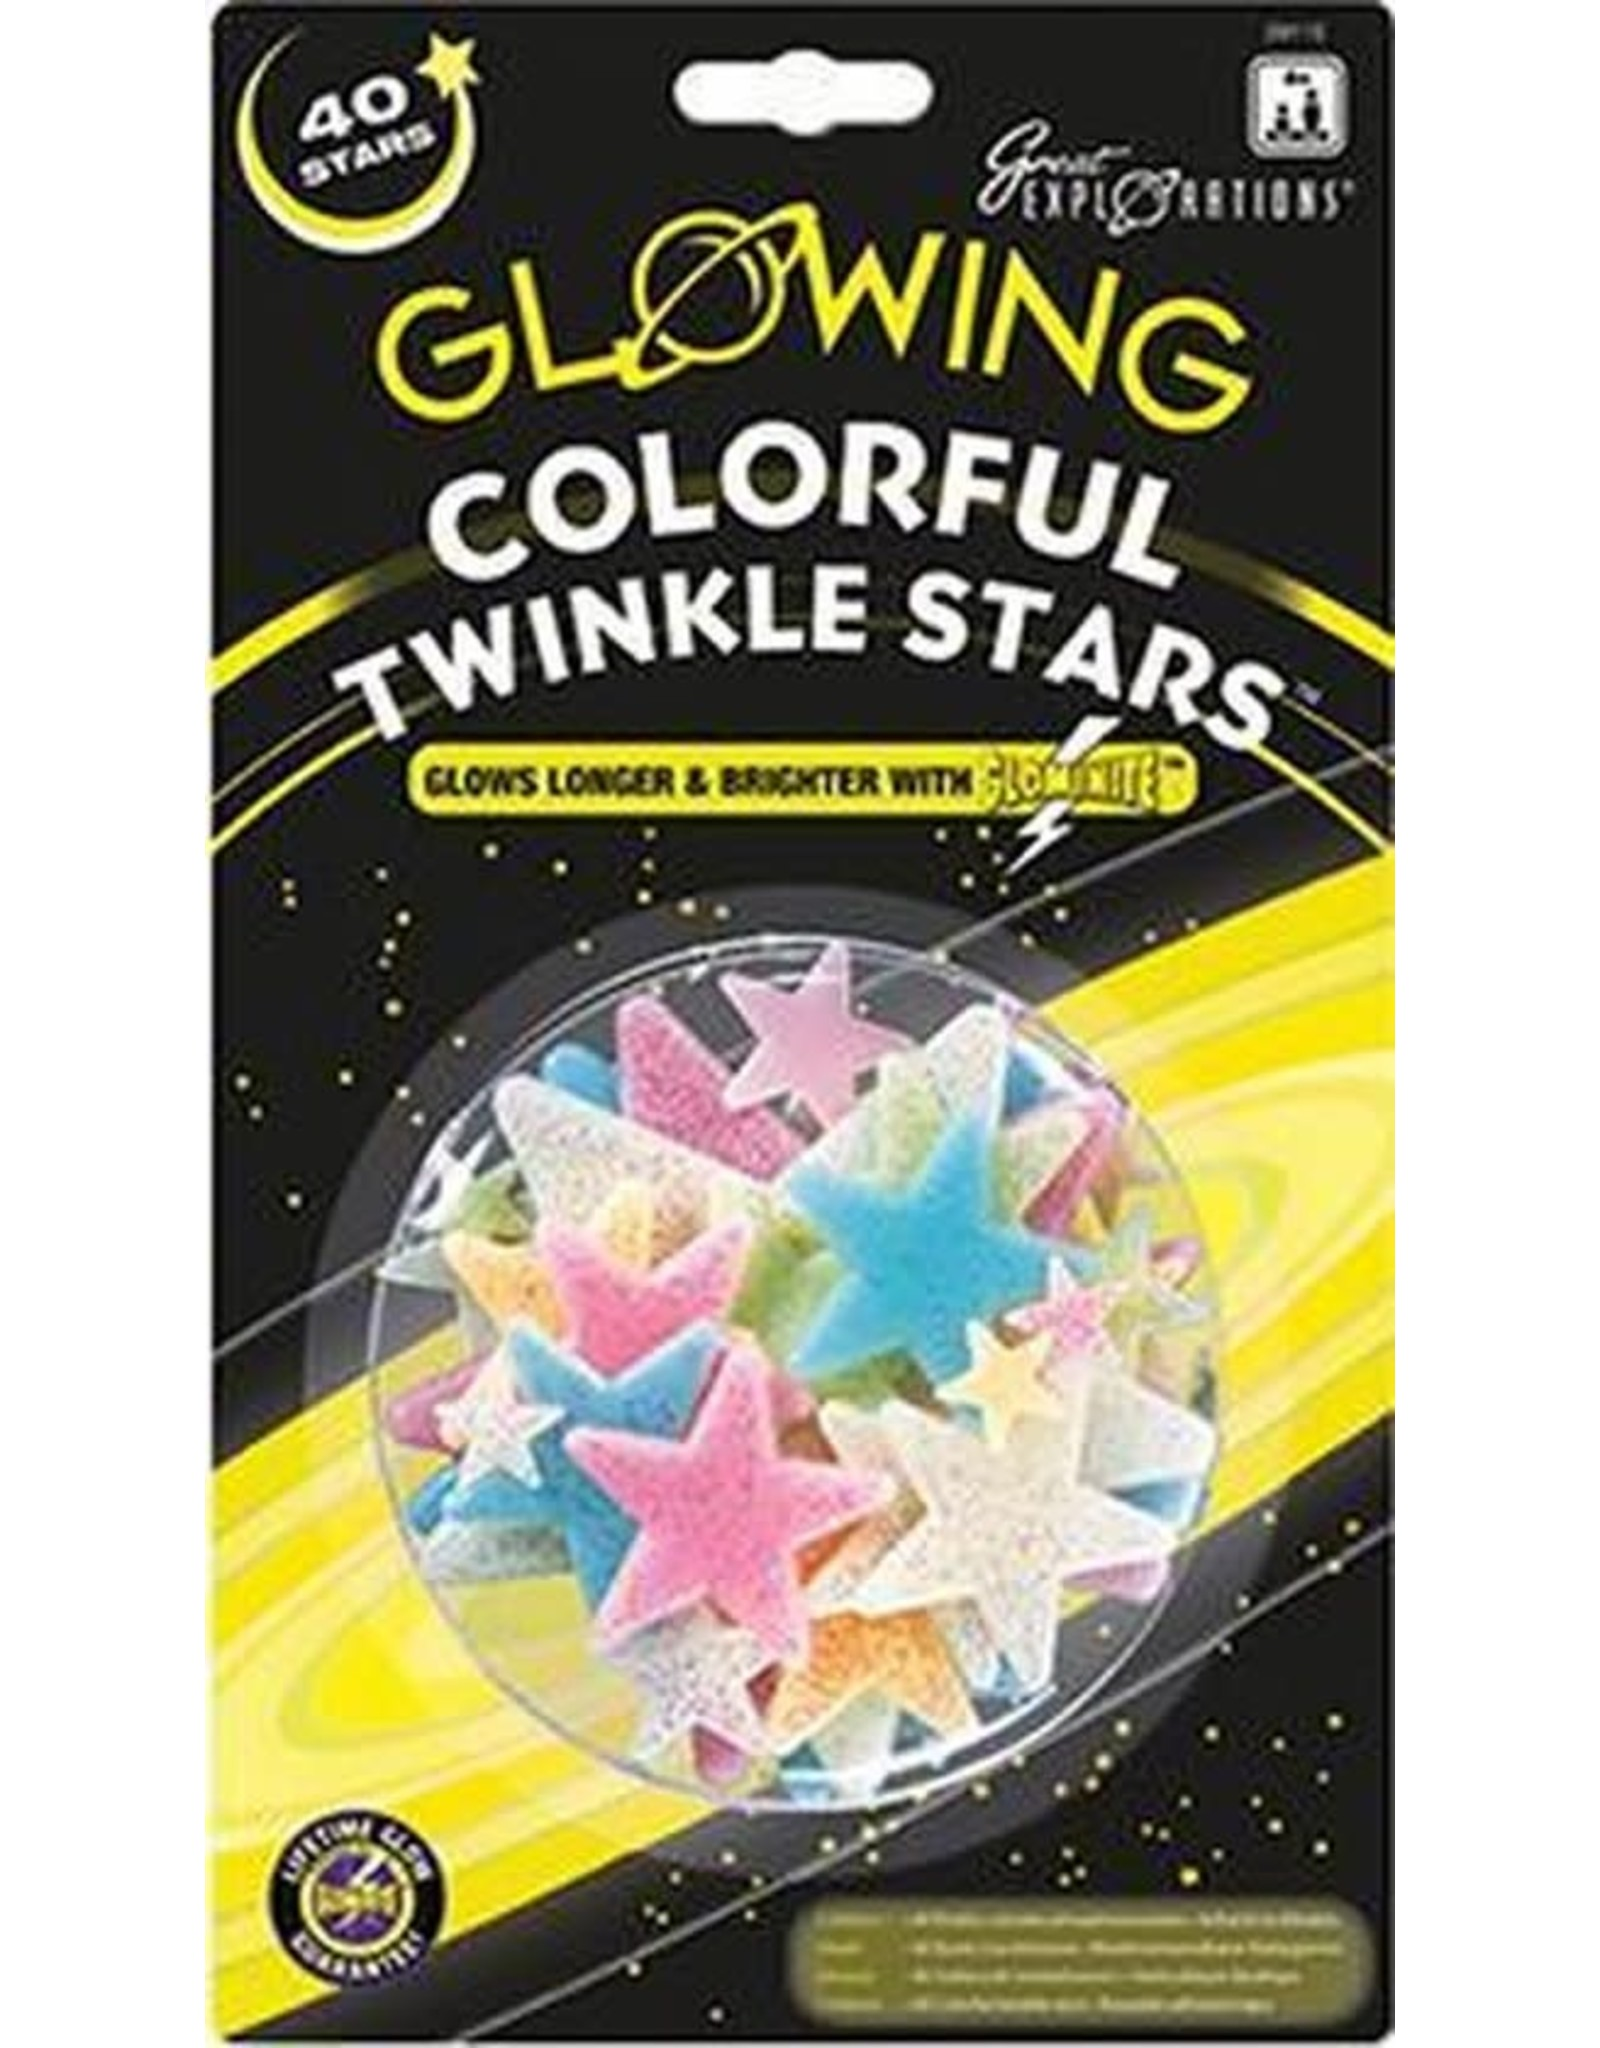 Glow in the Dark Sterren Colorful Twinkle Stars